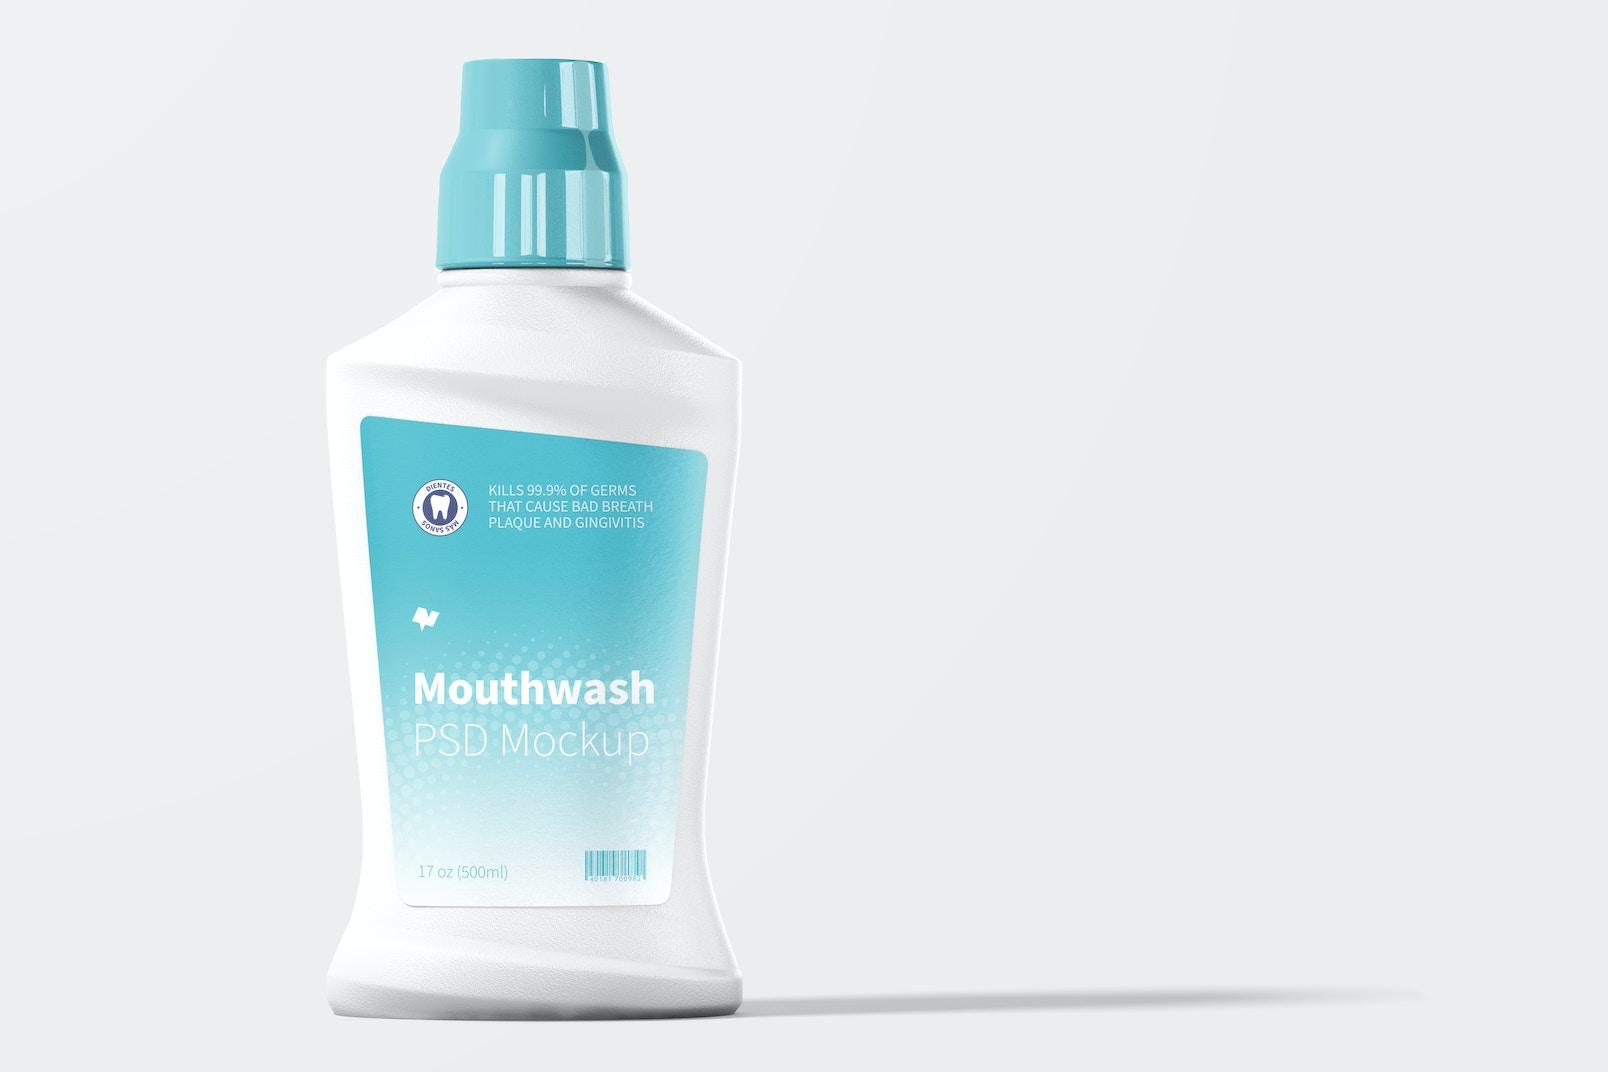 Mouthwash Bottle Mockup, Front View